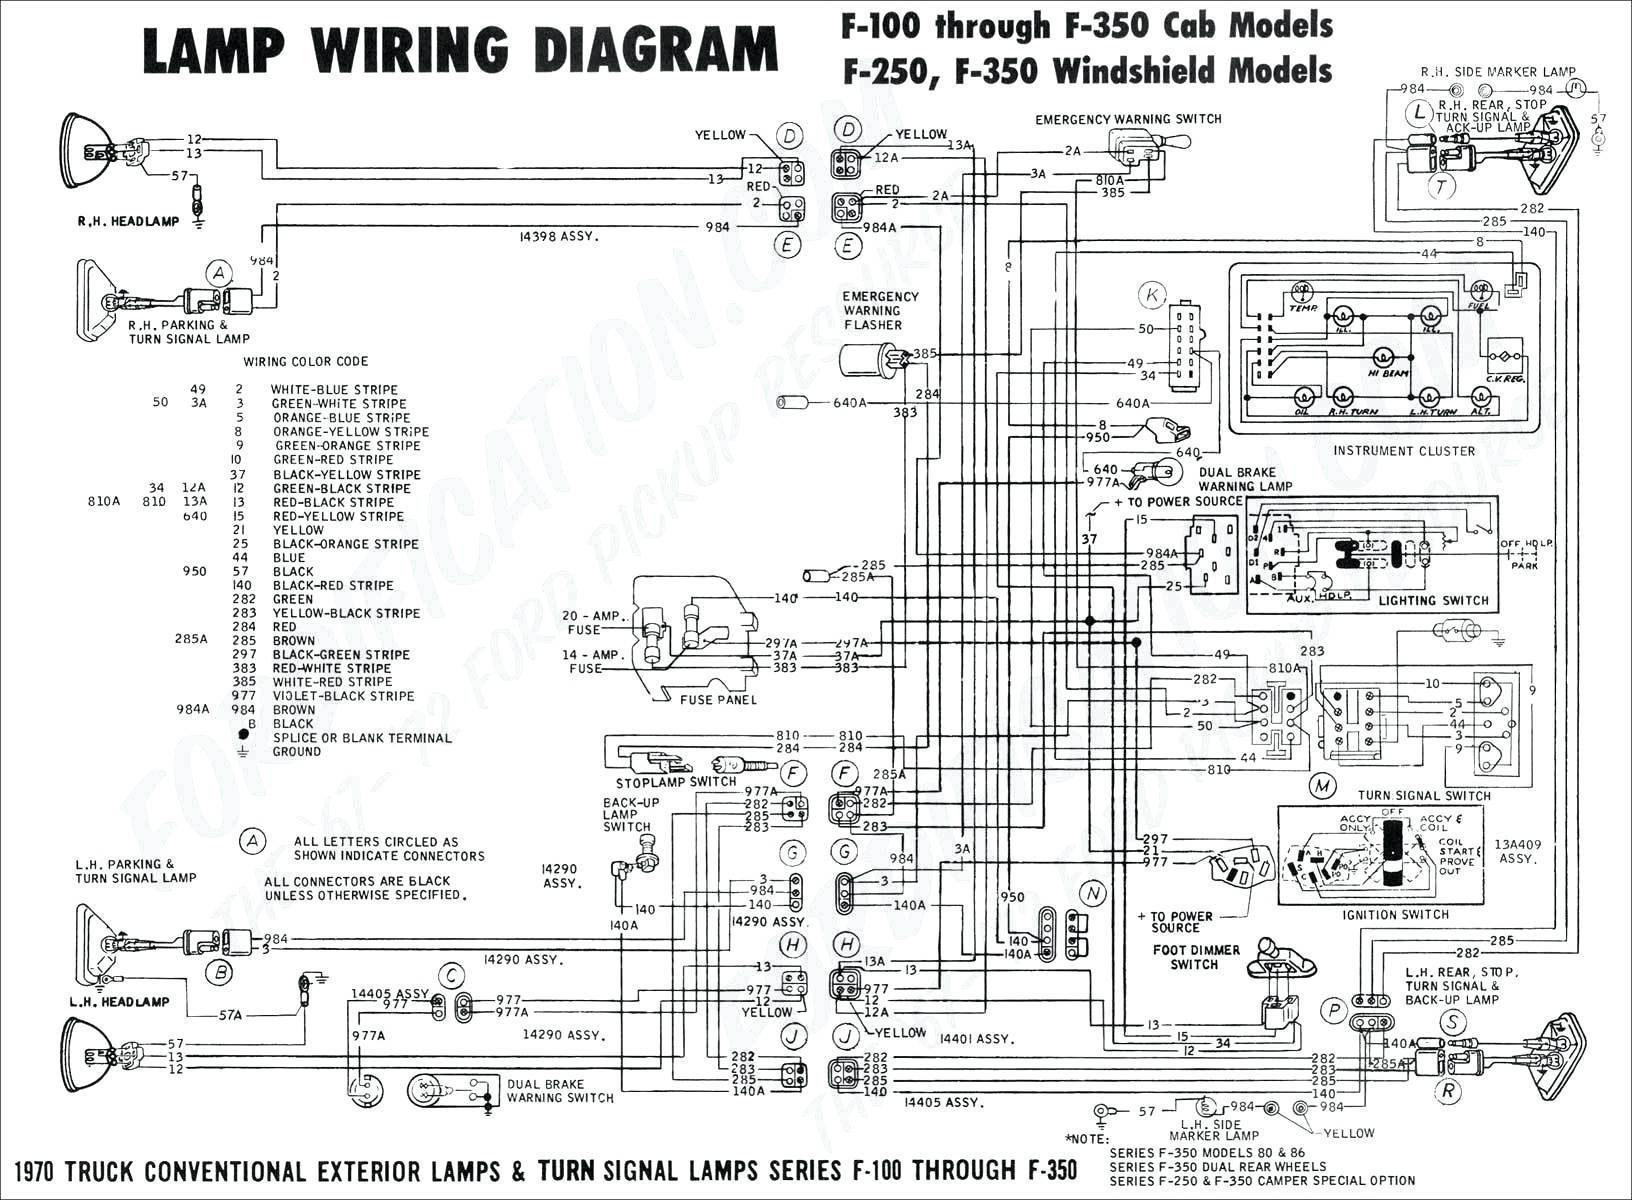 Big Dog Wiring Diagram | Wiring Diagram - Simple Motorcycle Wiring Diagram